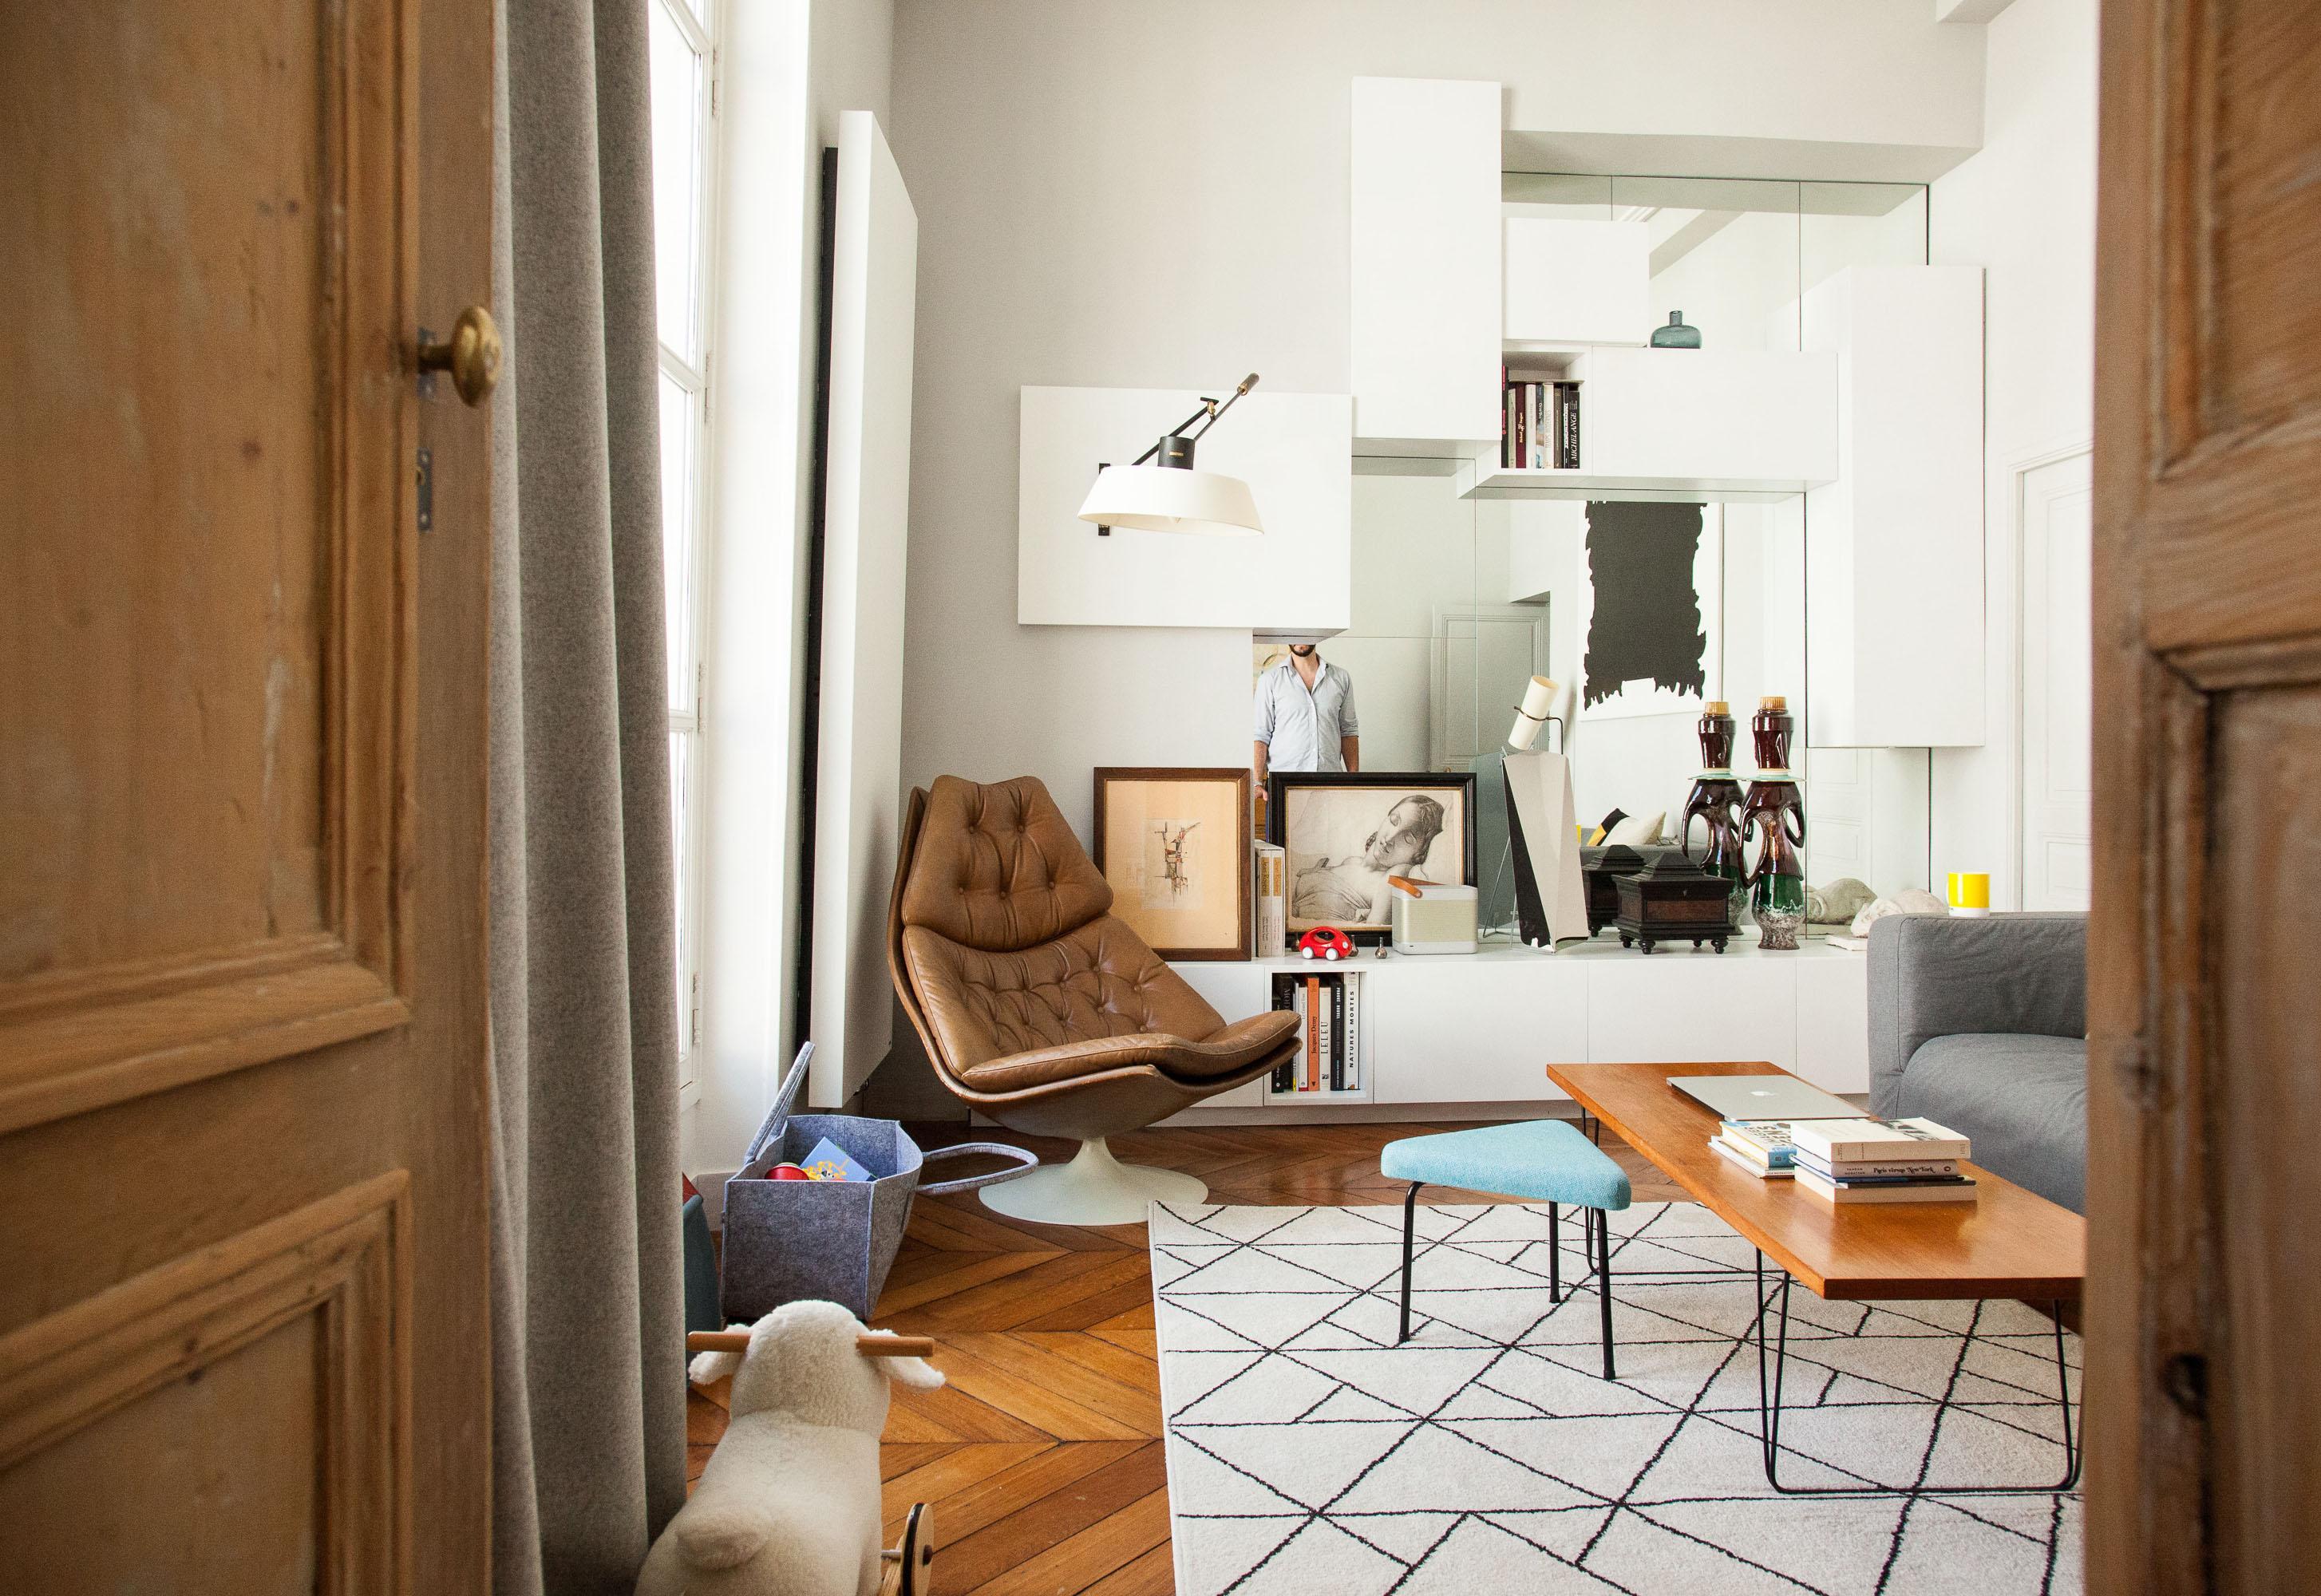 pi ce par pi ce the socialite family. Black Bedroom Furniture Sets. Home Design Ideas